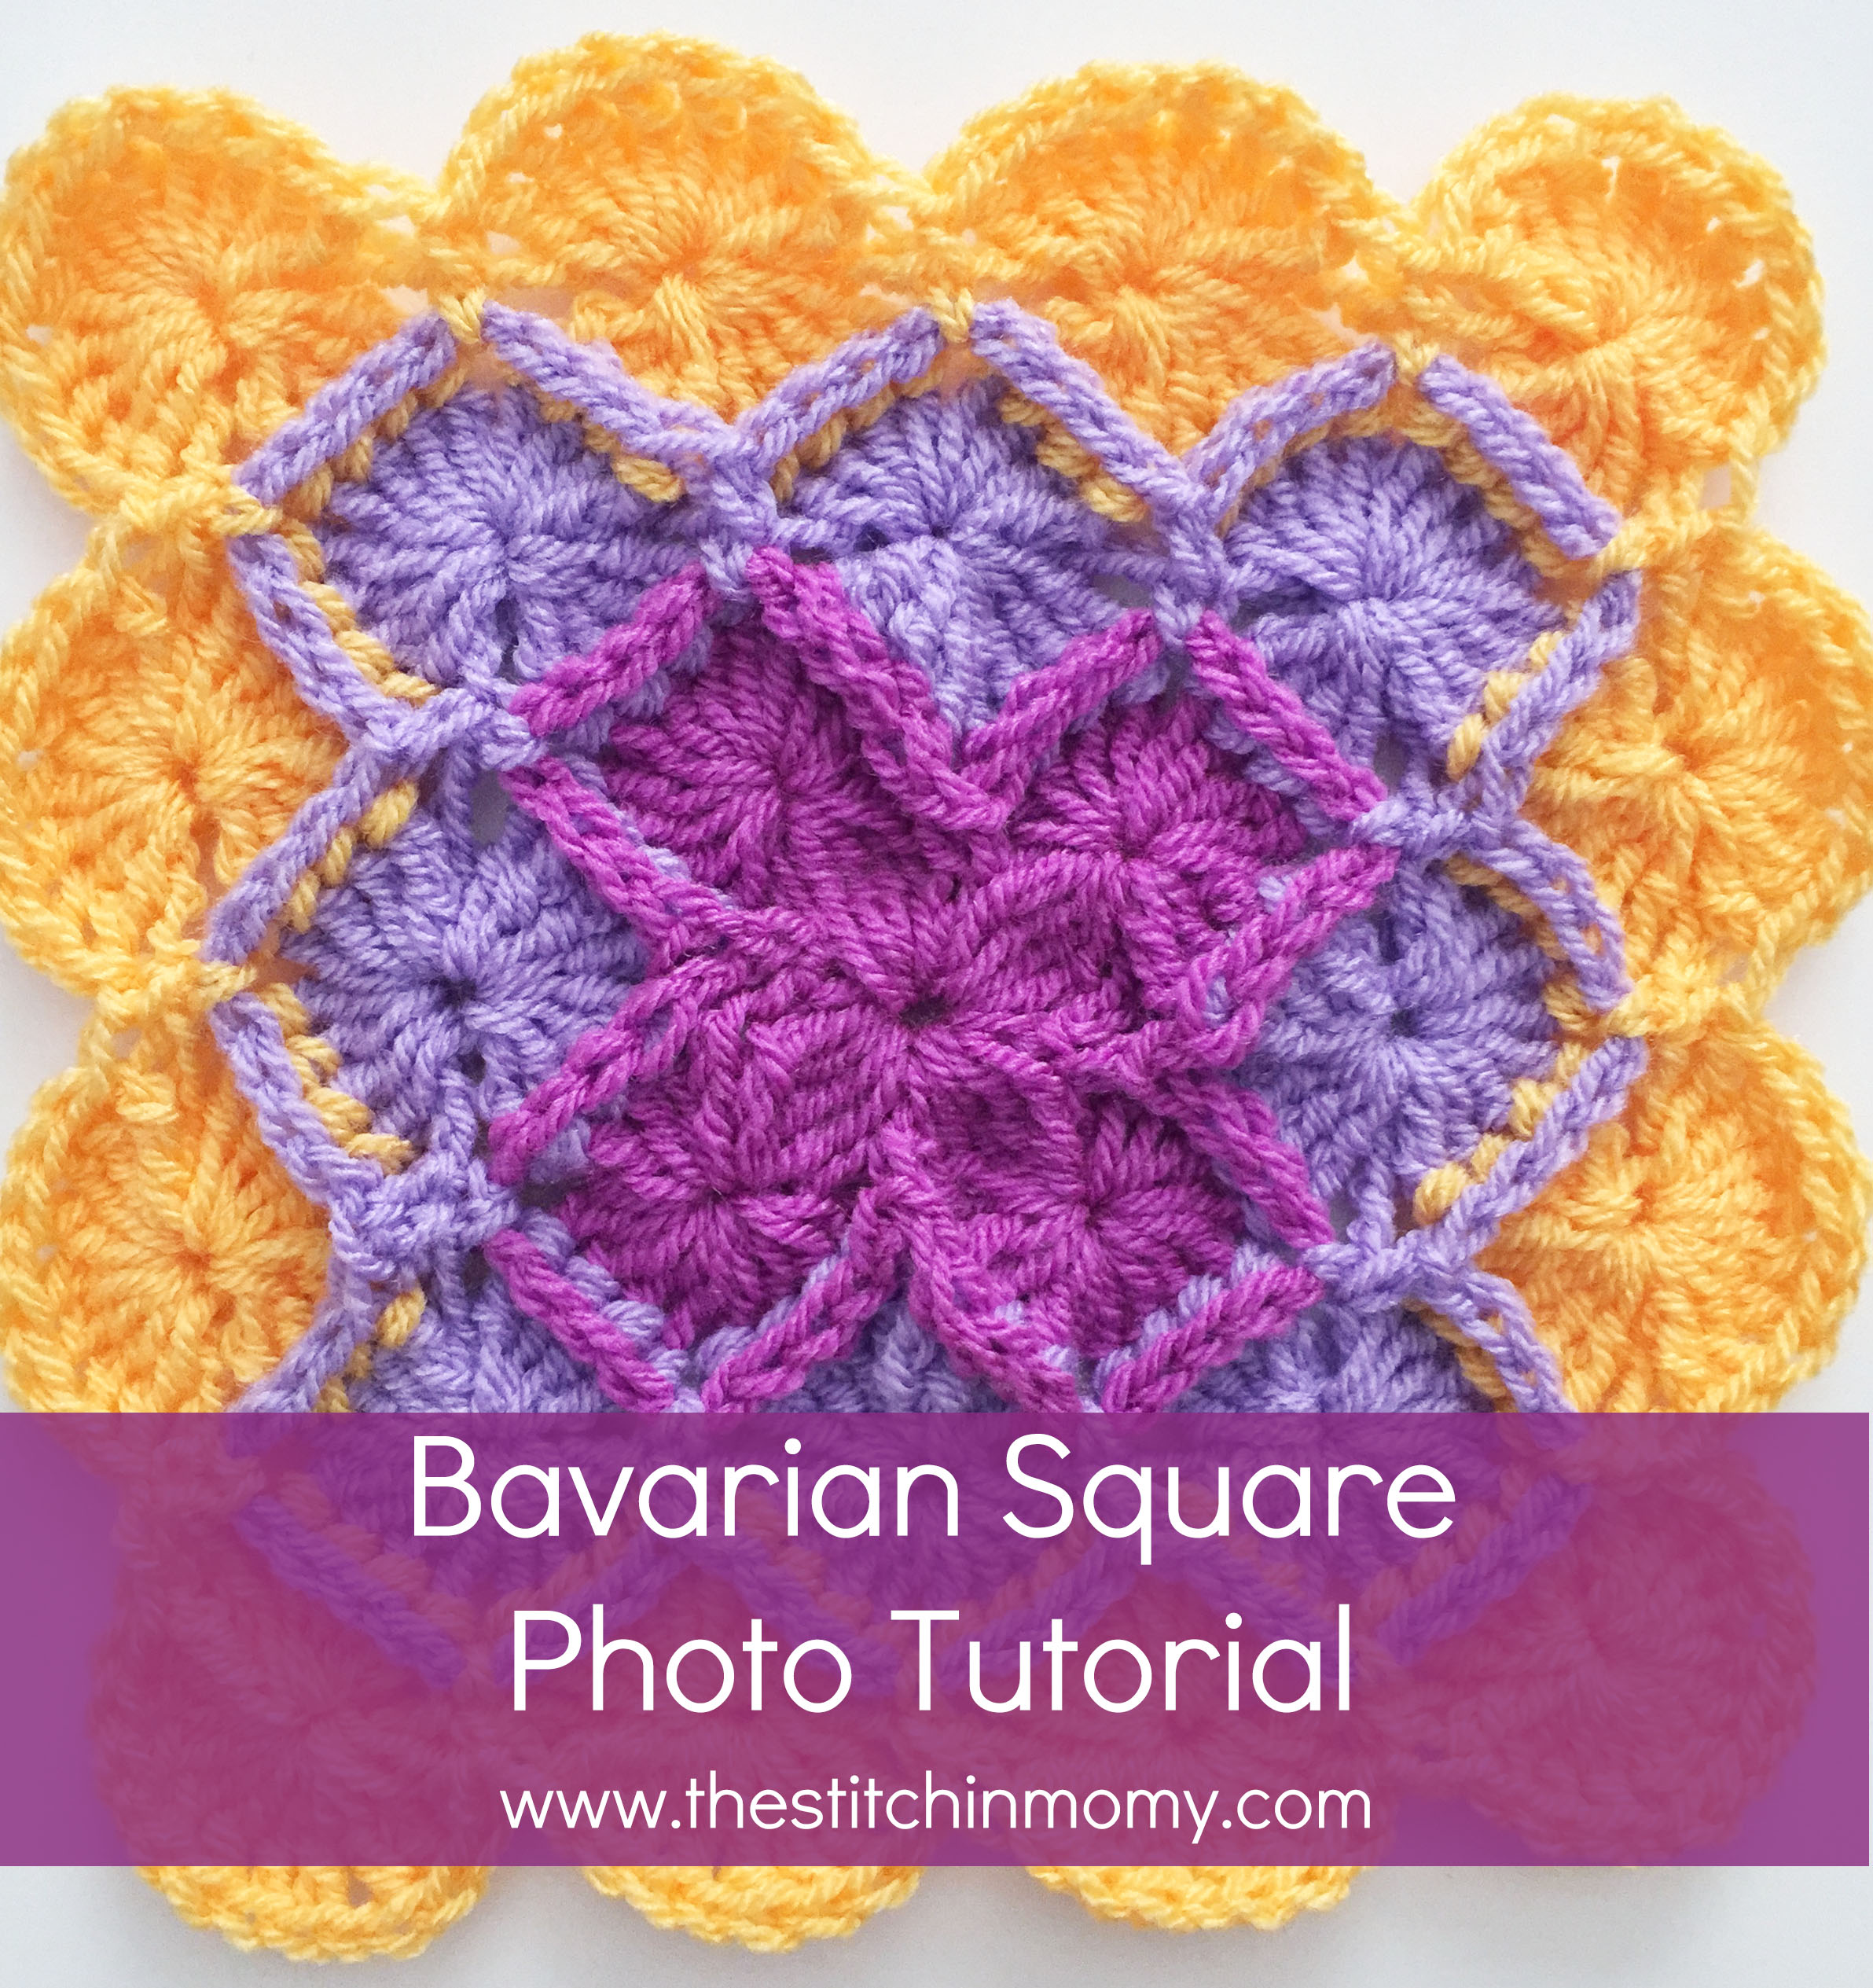 Bavarian Square Tutorial - The Stitchin Mommy